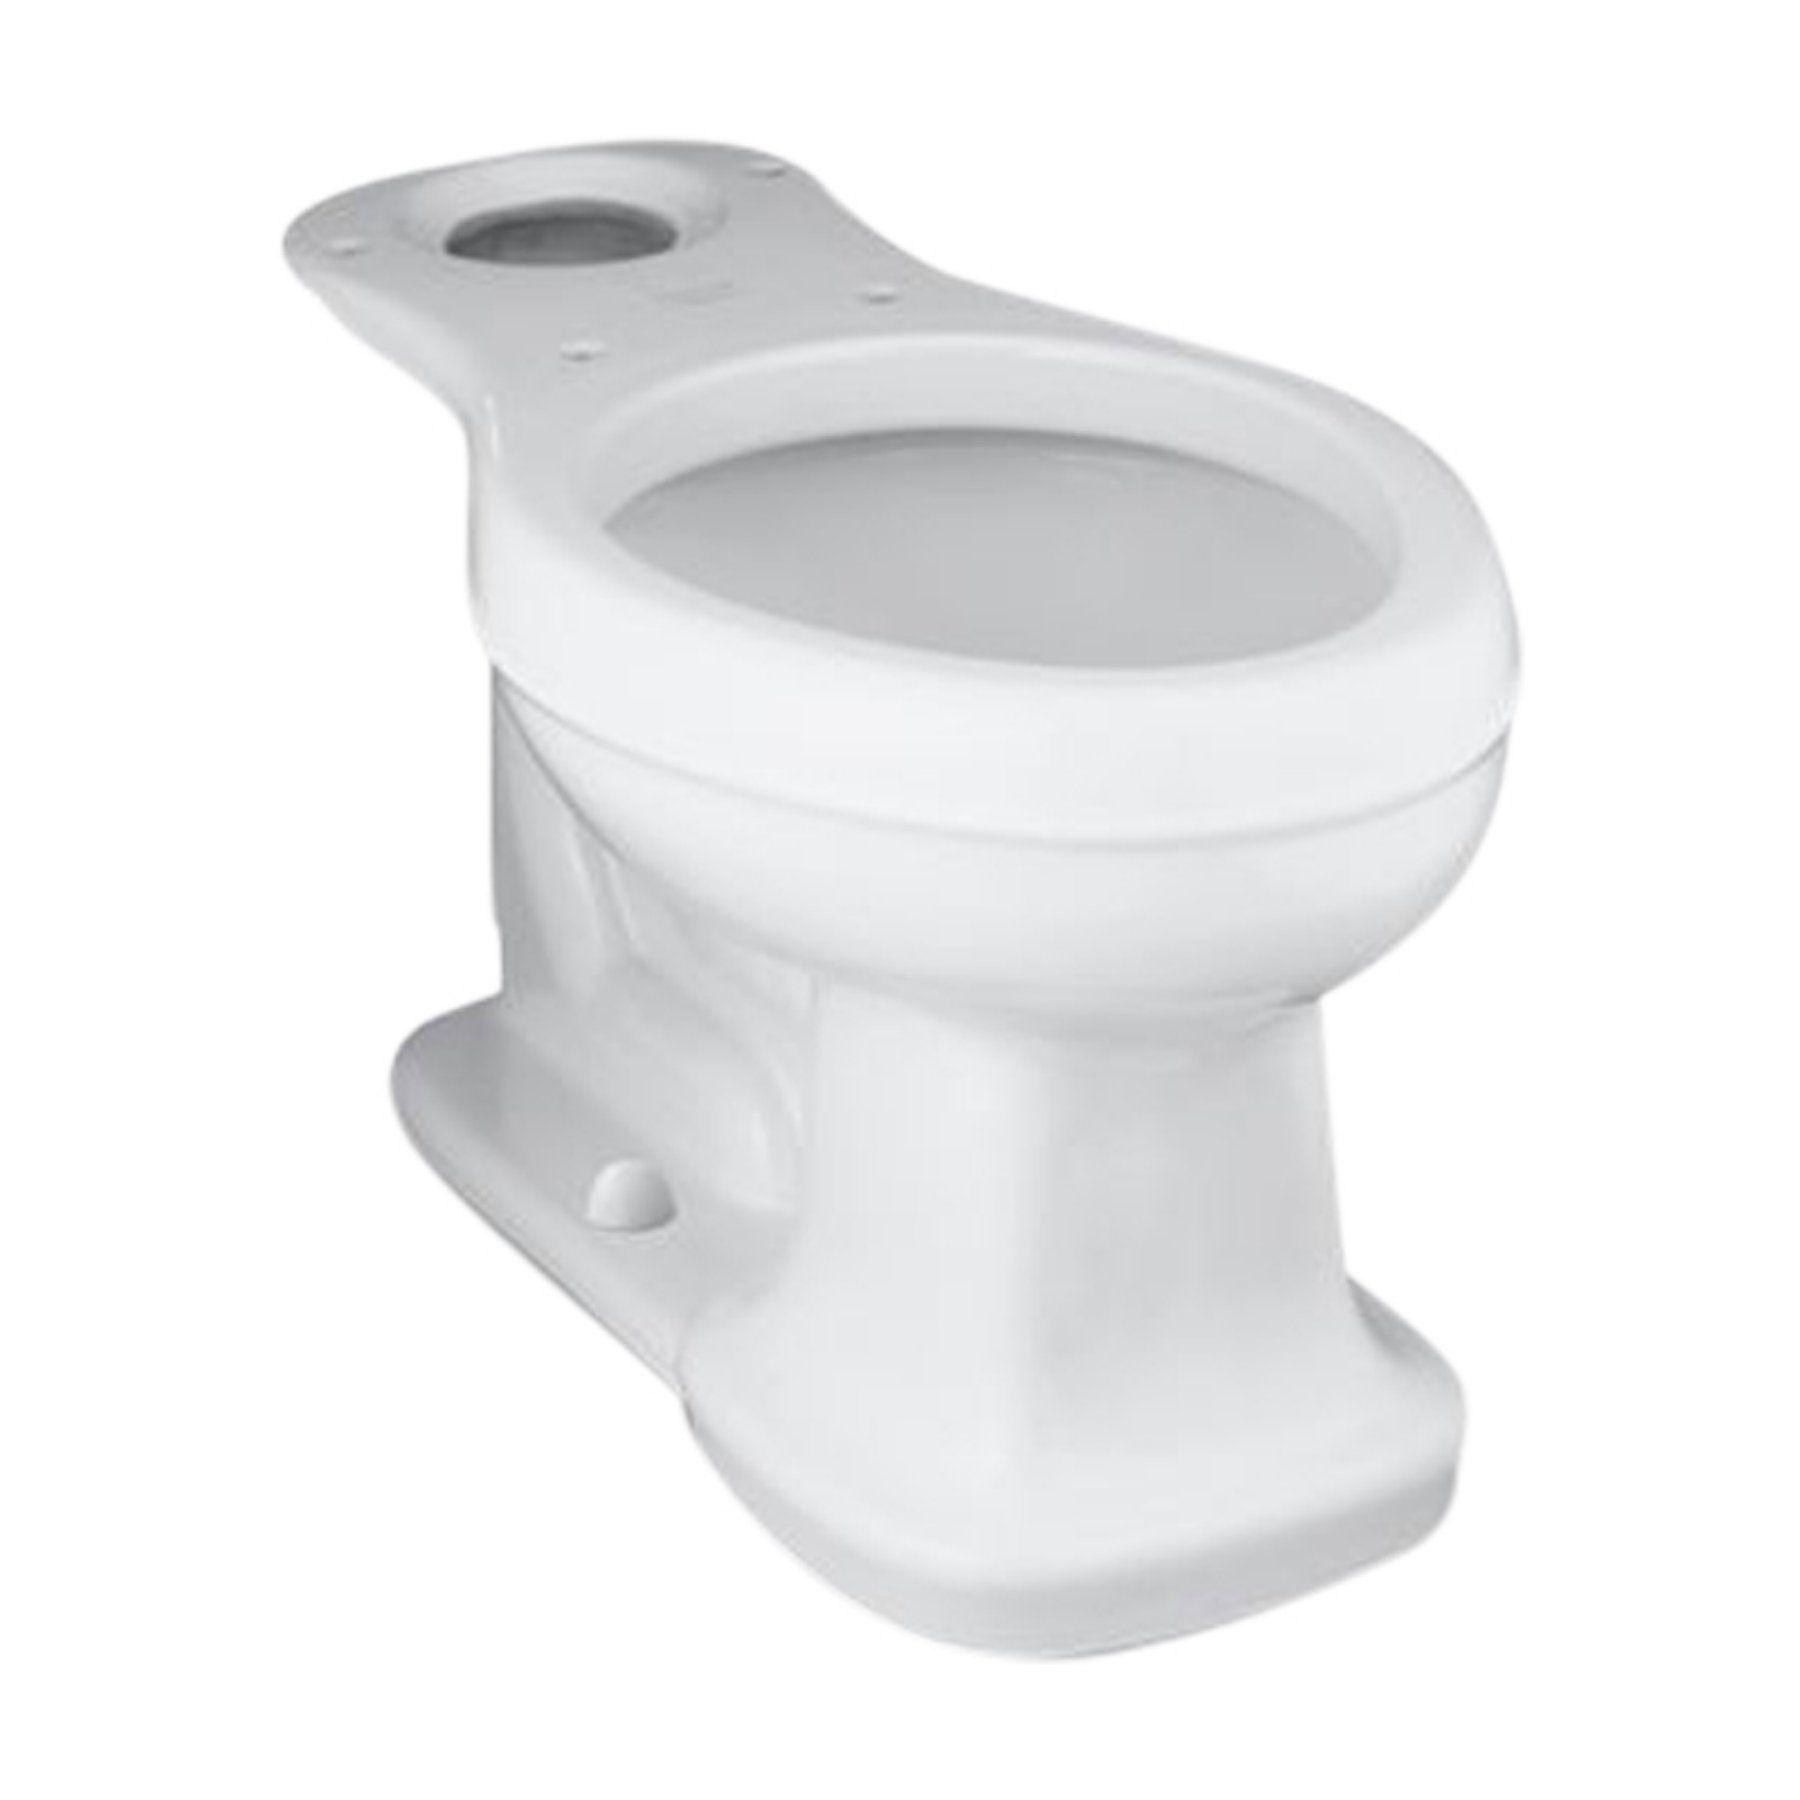 Magnificent Kohler Bancroft Comfort Height Elongated Toilet Bowl Pdpeps Interior Chair Design Pdpepsorg